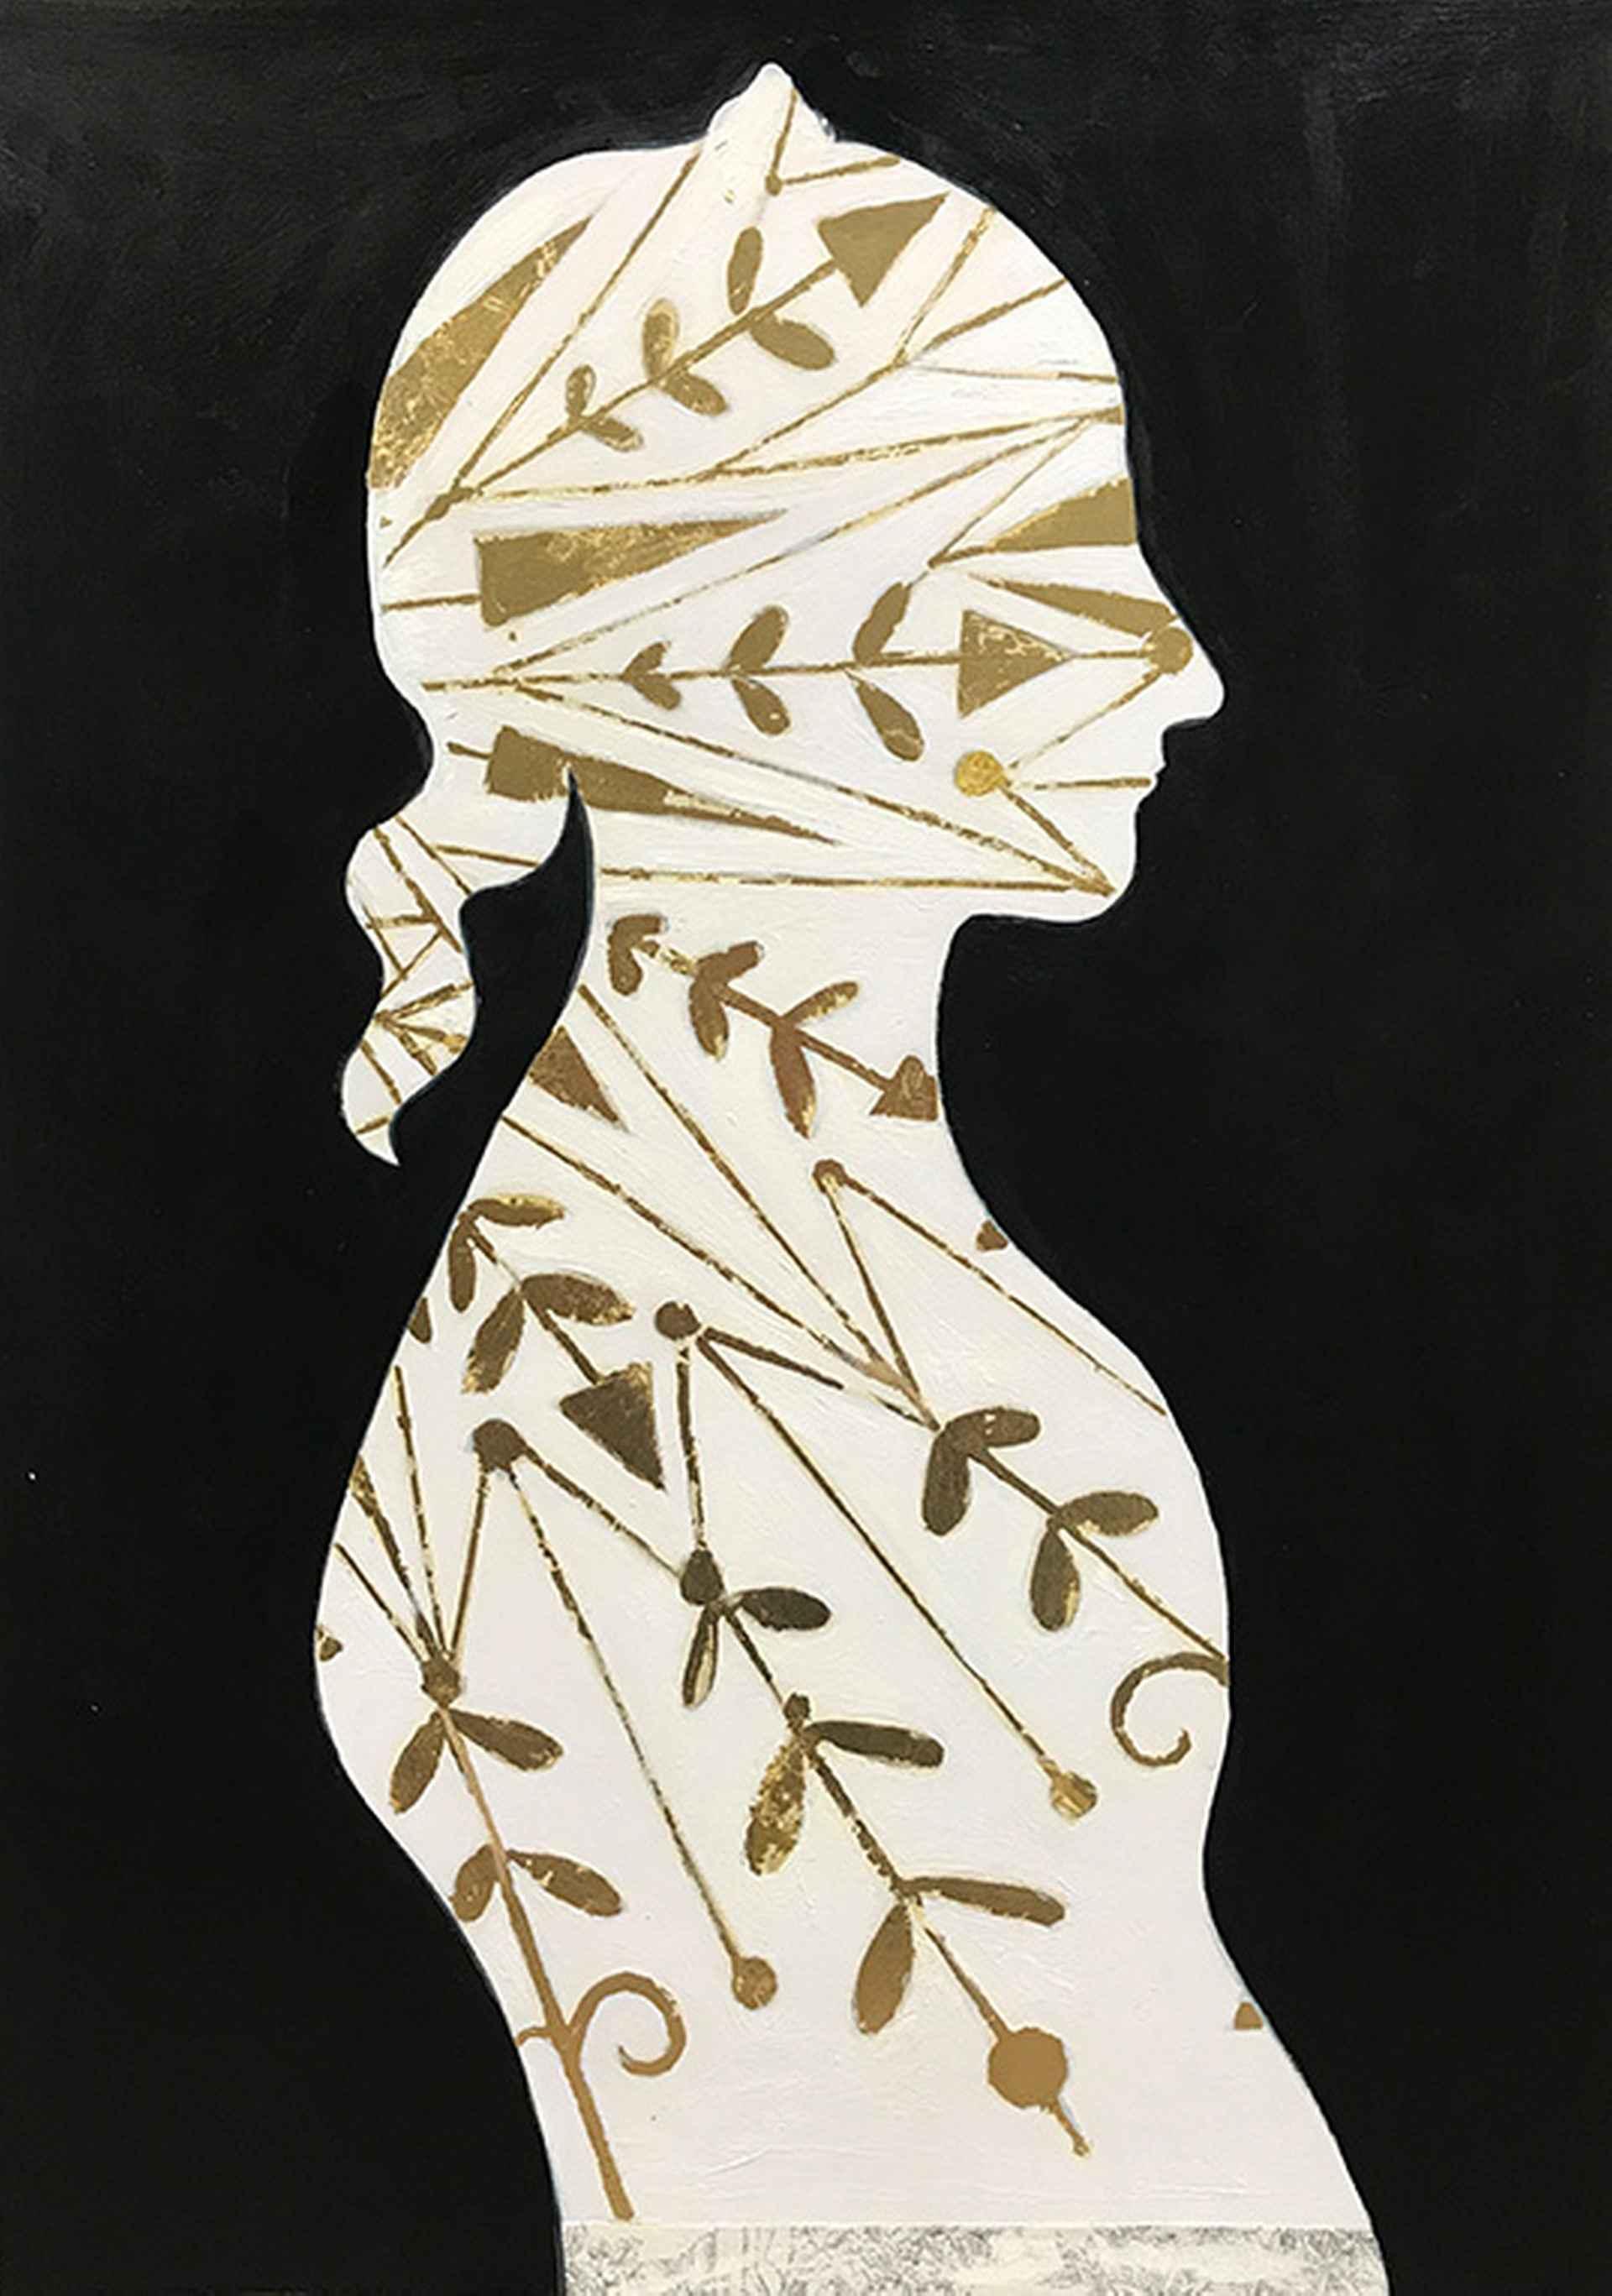 Golden Arrow #2 by Karenina Fabrizzi